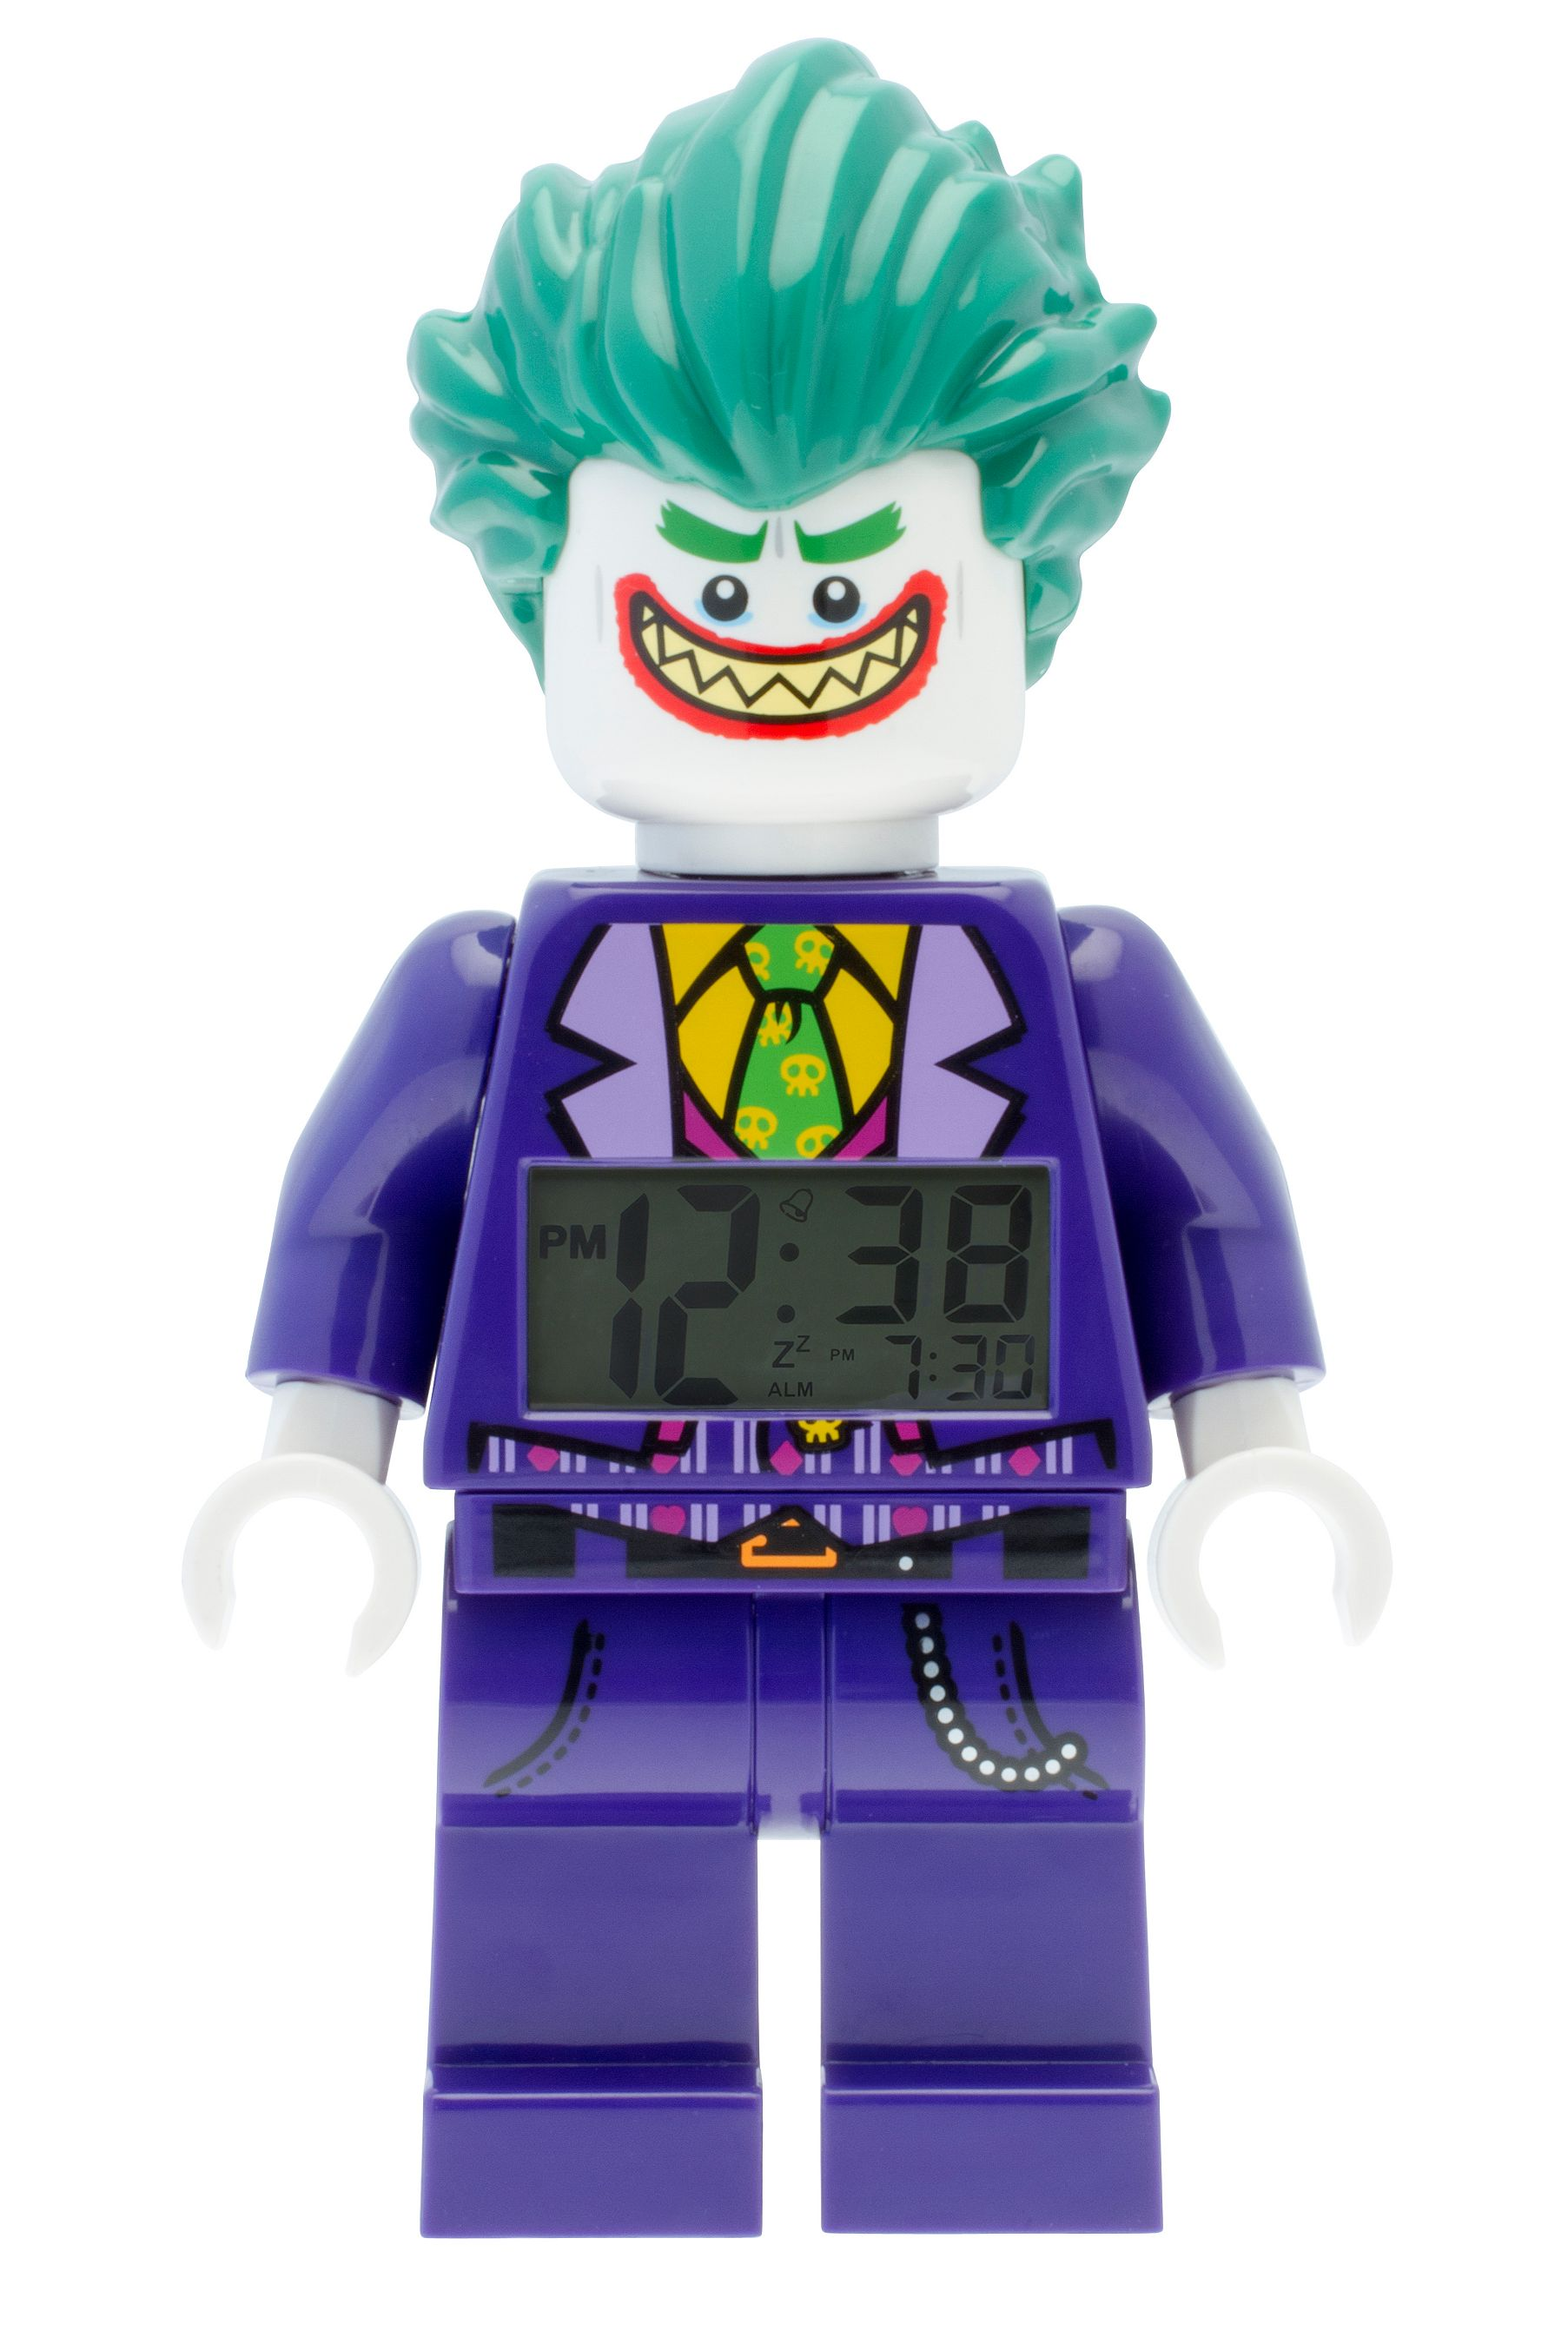 THE LEGO® BATMAN MOVIE The Joker™ Minifigure Alarm Clock ...